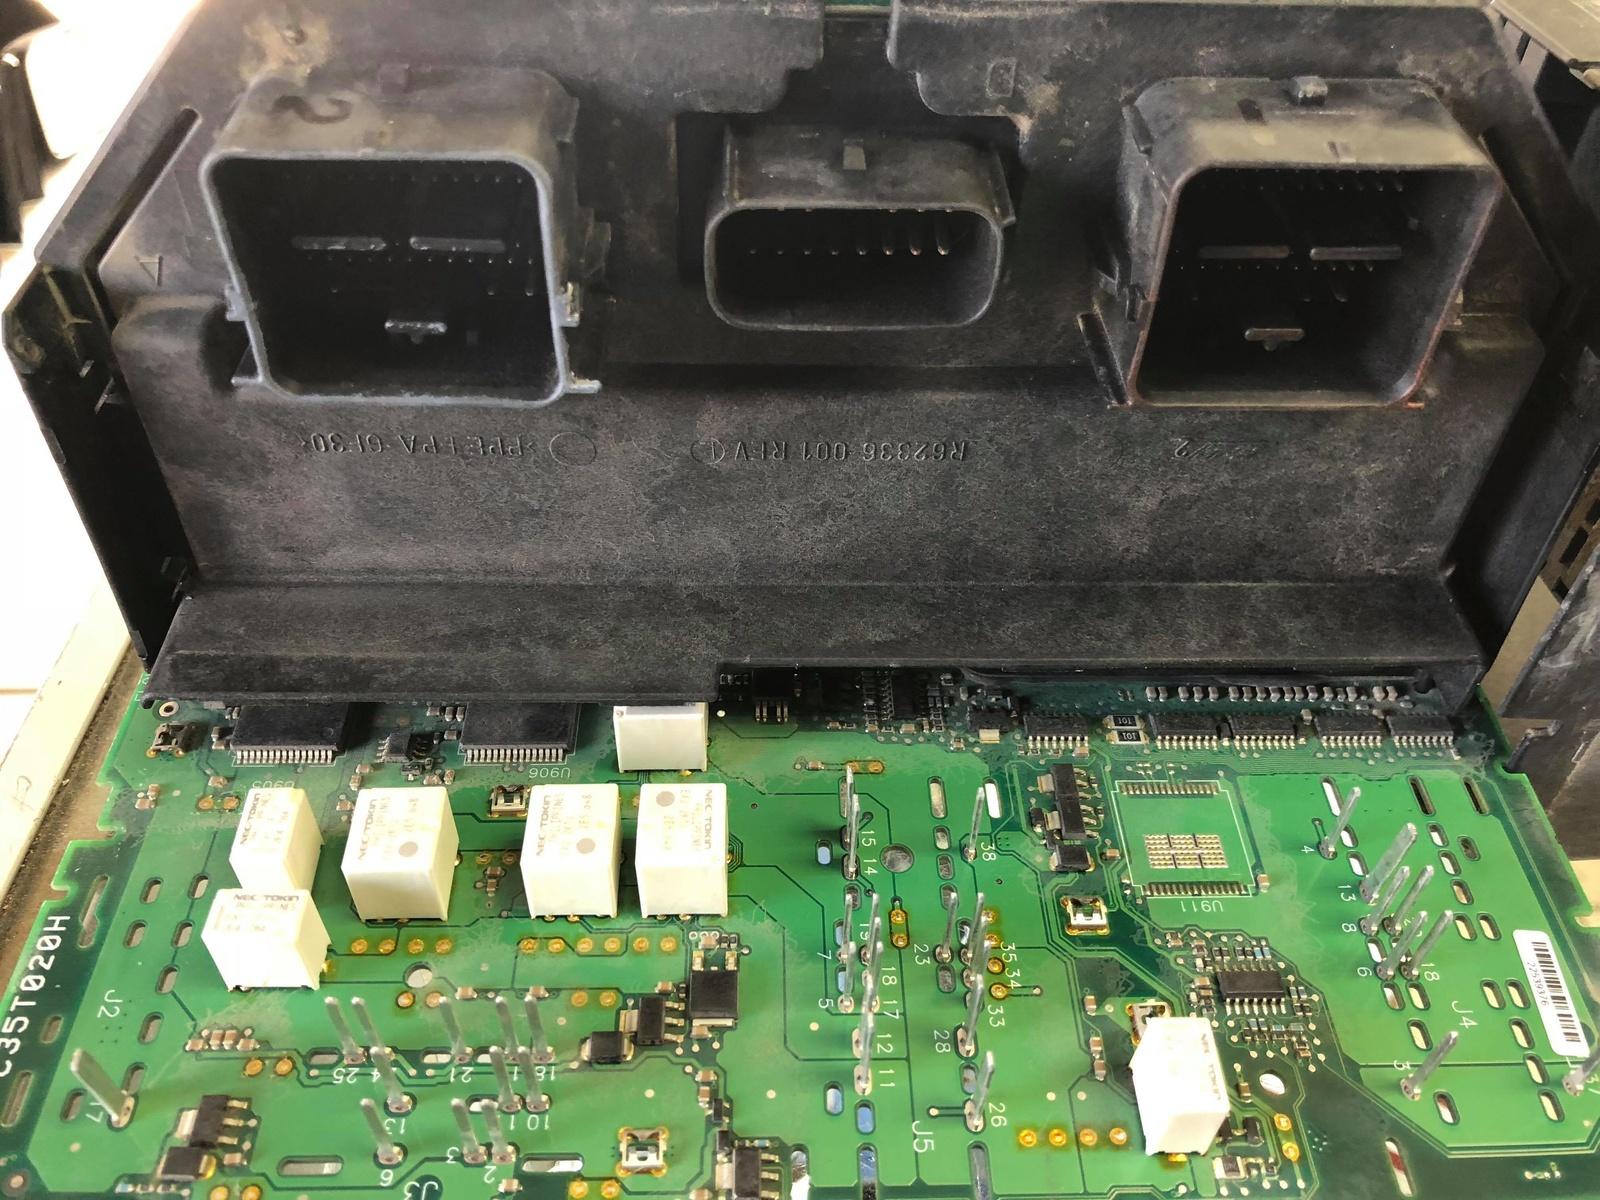 1994 dodge dakota ignition switch wiring diagram lucas dr2 wiper motor ram 1500 questions how do i fix my turn signal blinker mark helpful